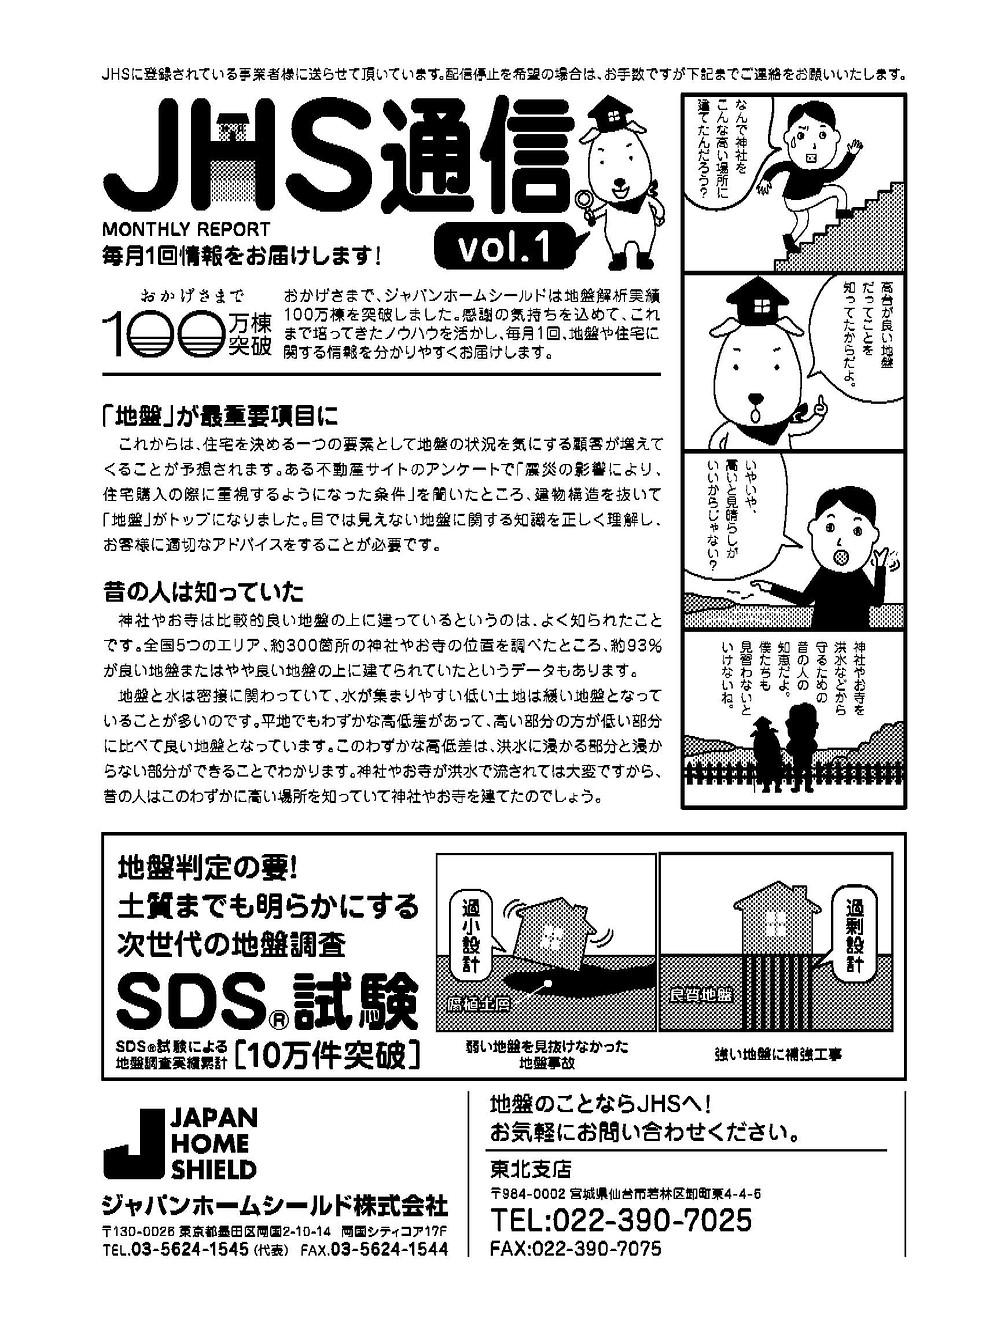 Fax 2015-6-20 12;21;2.JPG